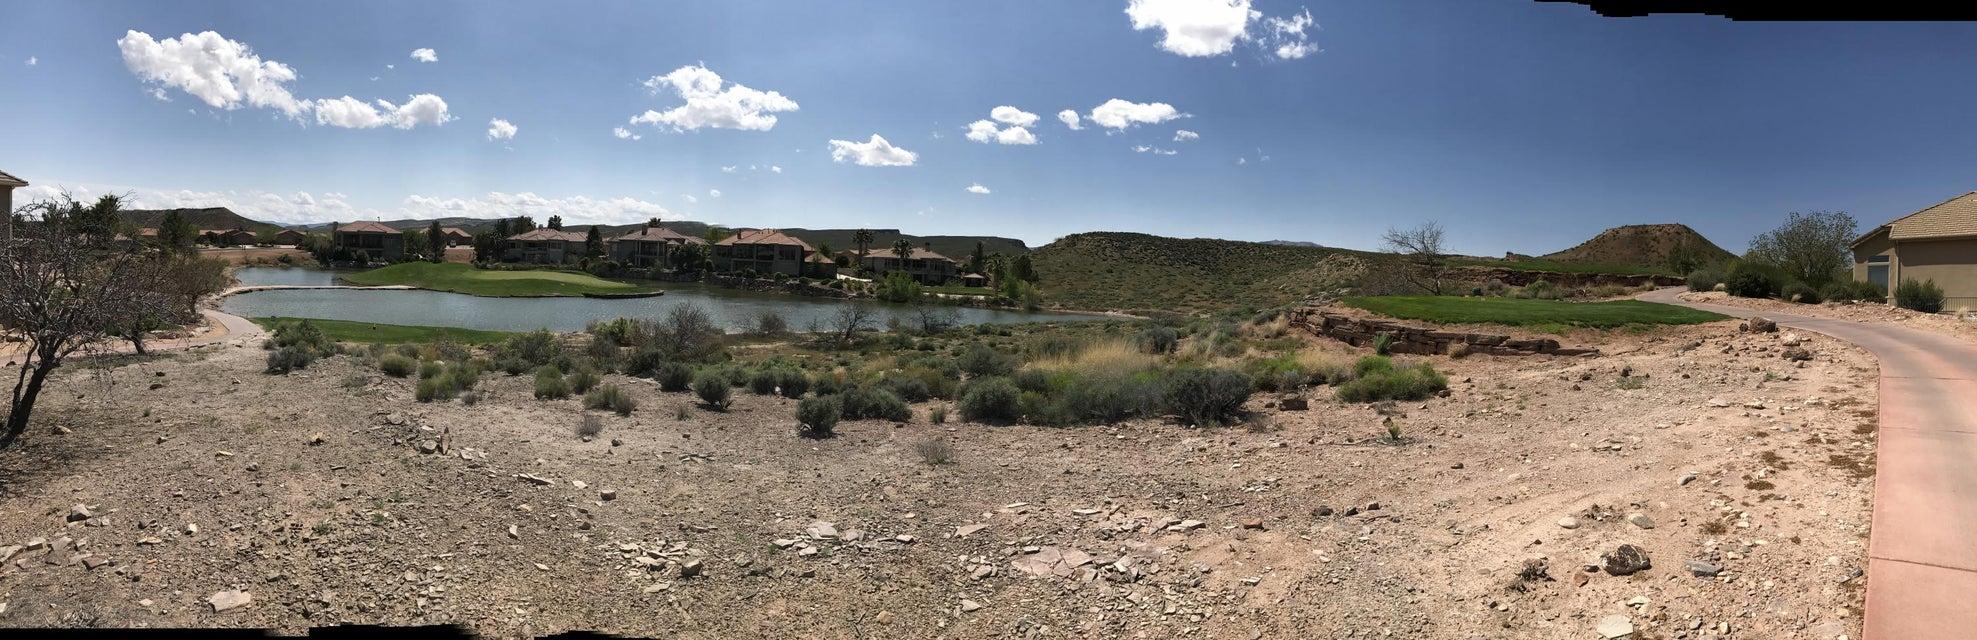 Additional photo for property listing at 221 Emeraud Drive 221 Emeraud Drive St. George, Utah 84770 États-Unis